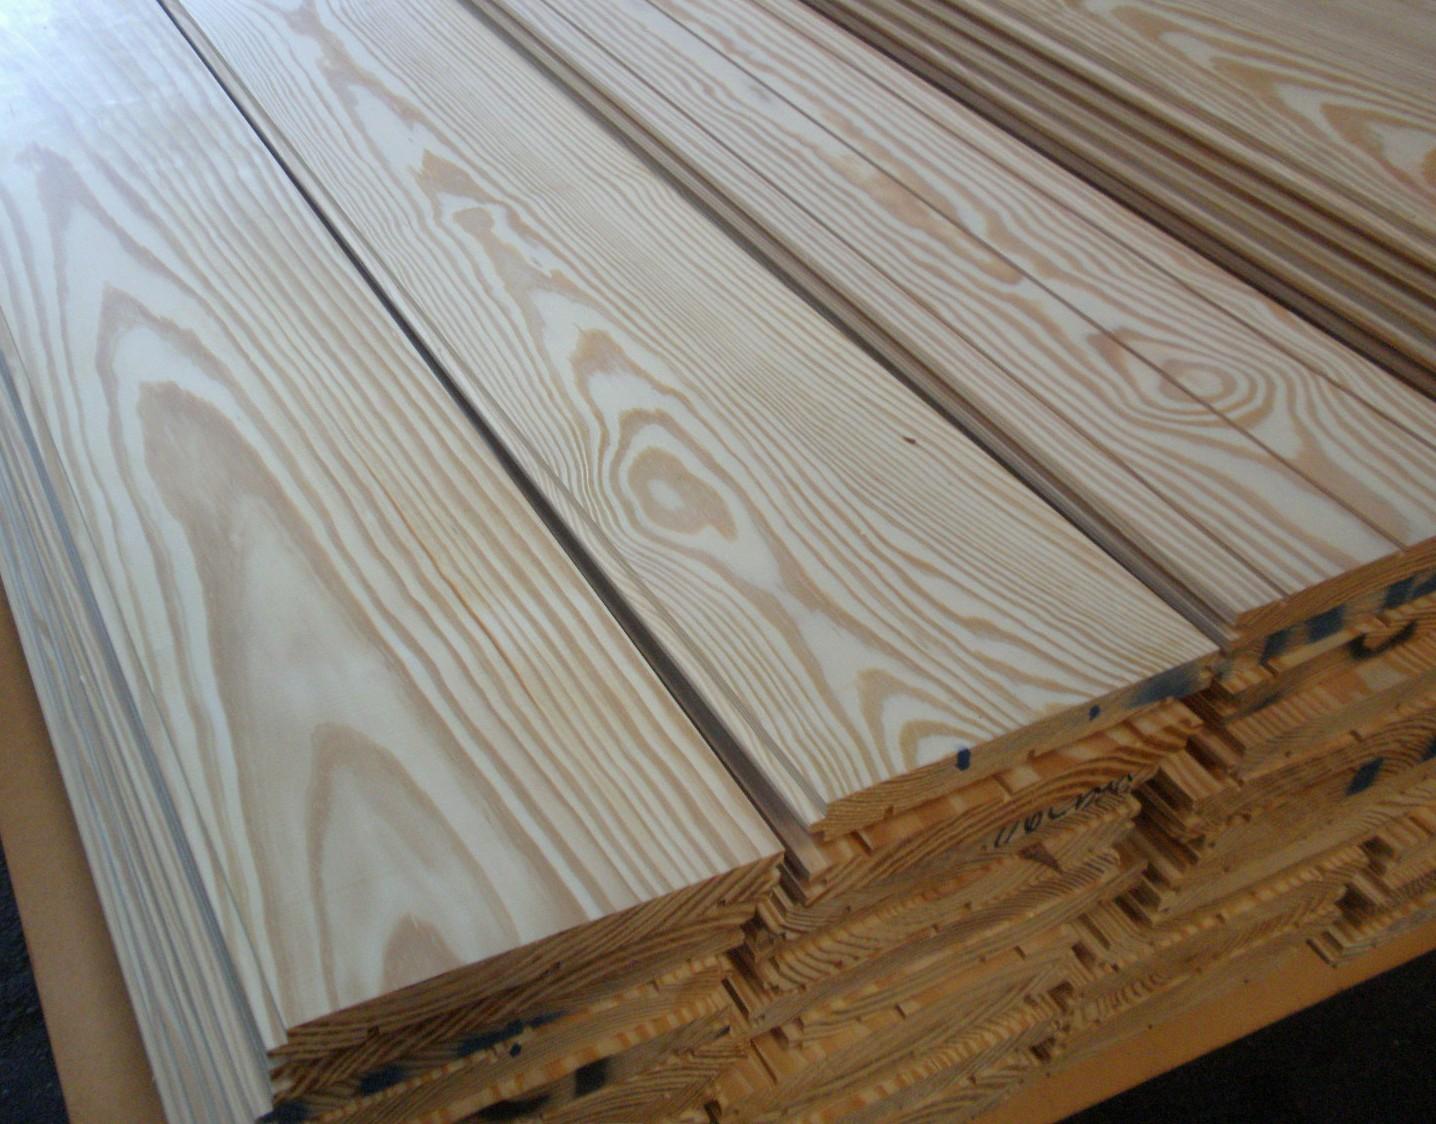 Houten Vloeren Arnhem : Massief houten vloeren vloerdelen vloerplanken vloerhout